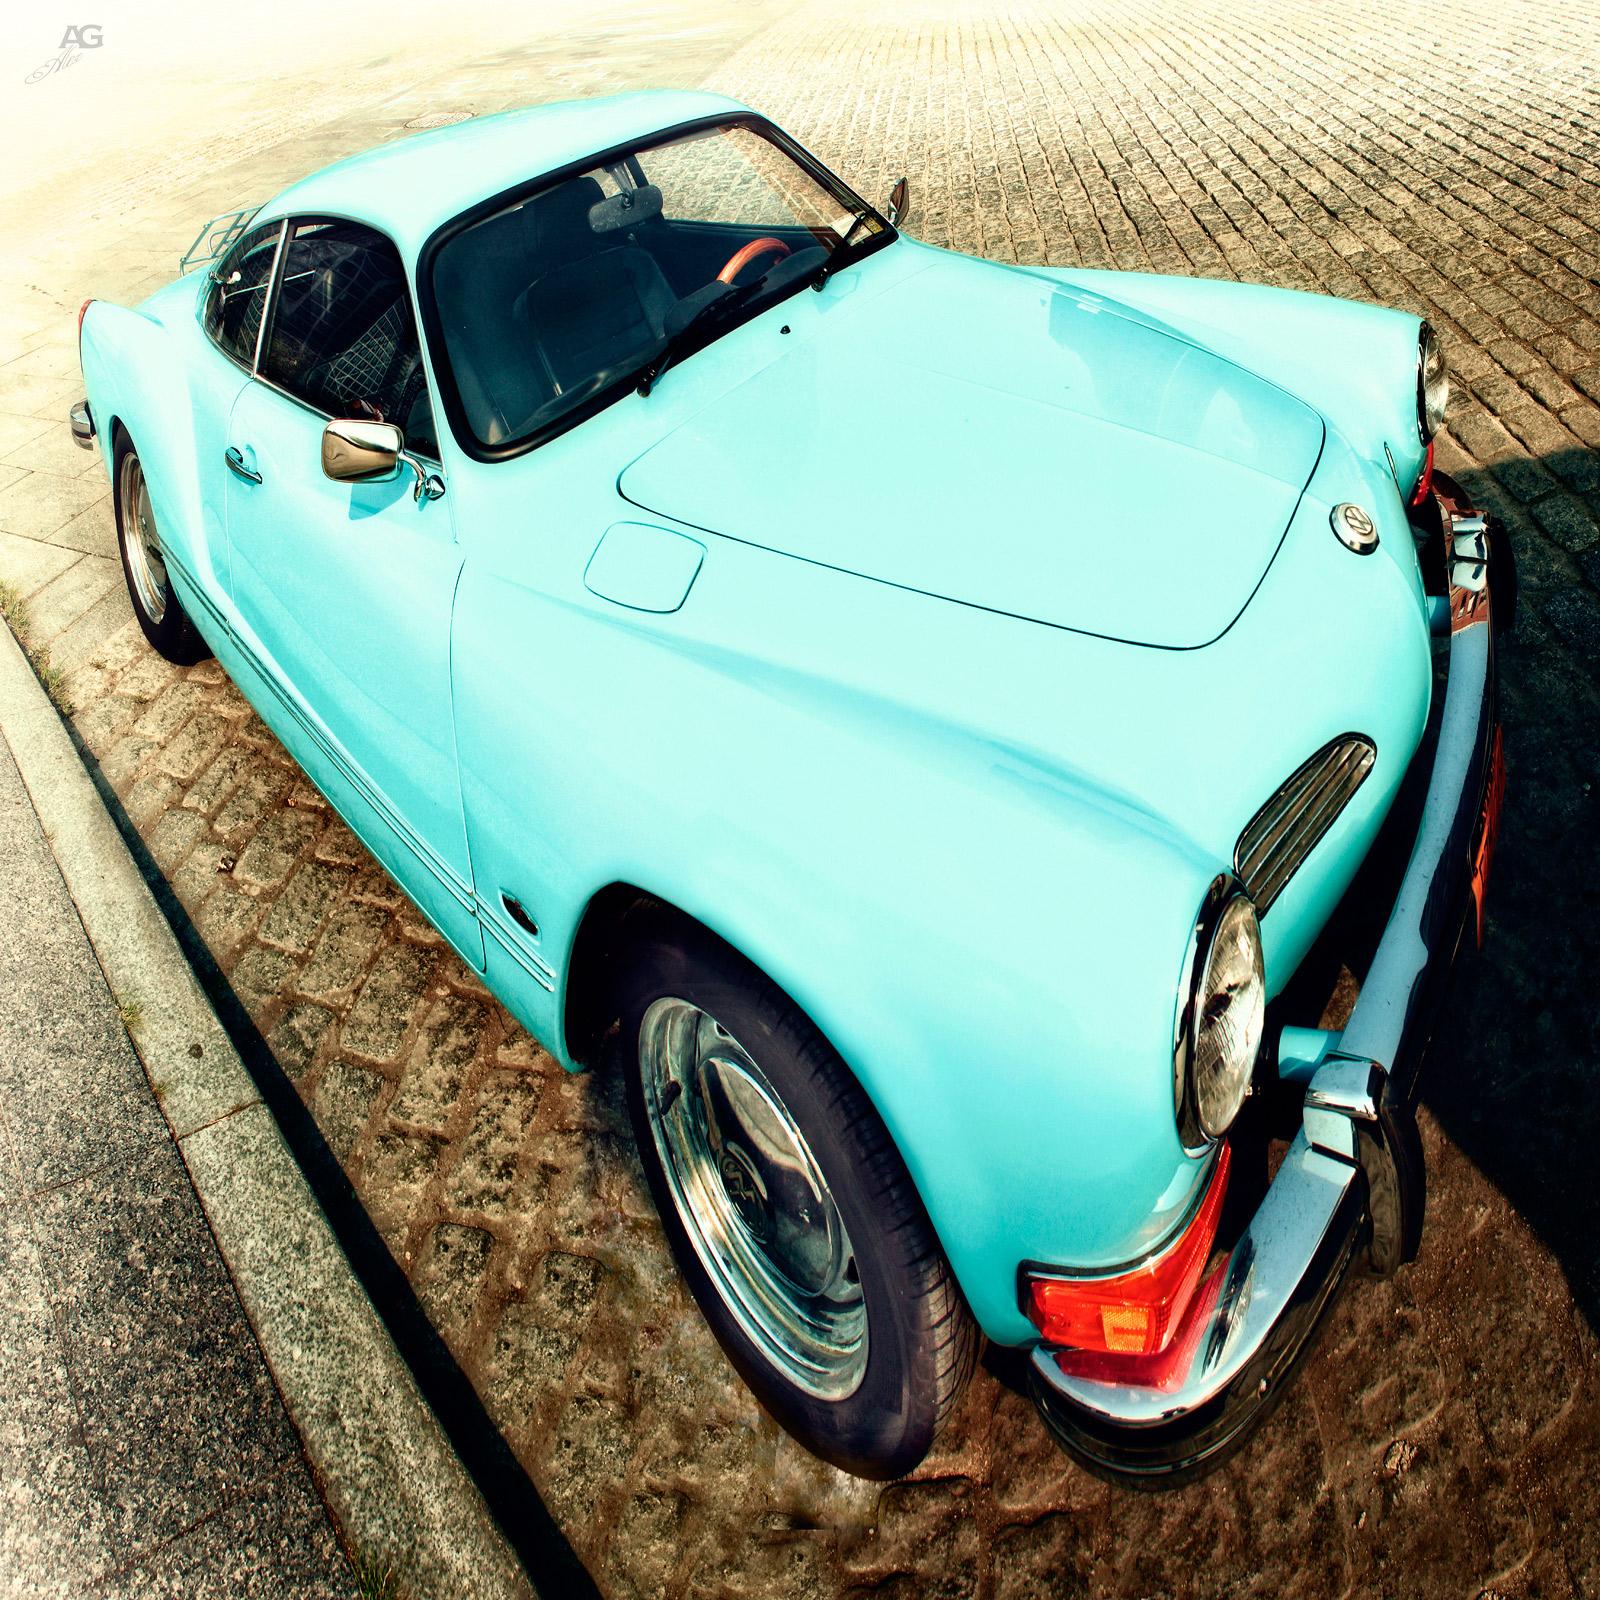 BlueWolkswagenSportsCartInLongIslandCity_squished_1600